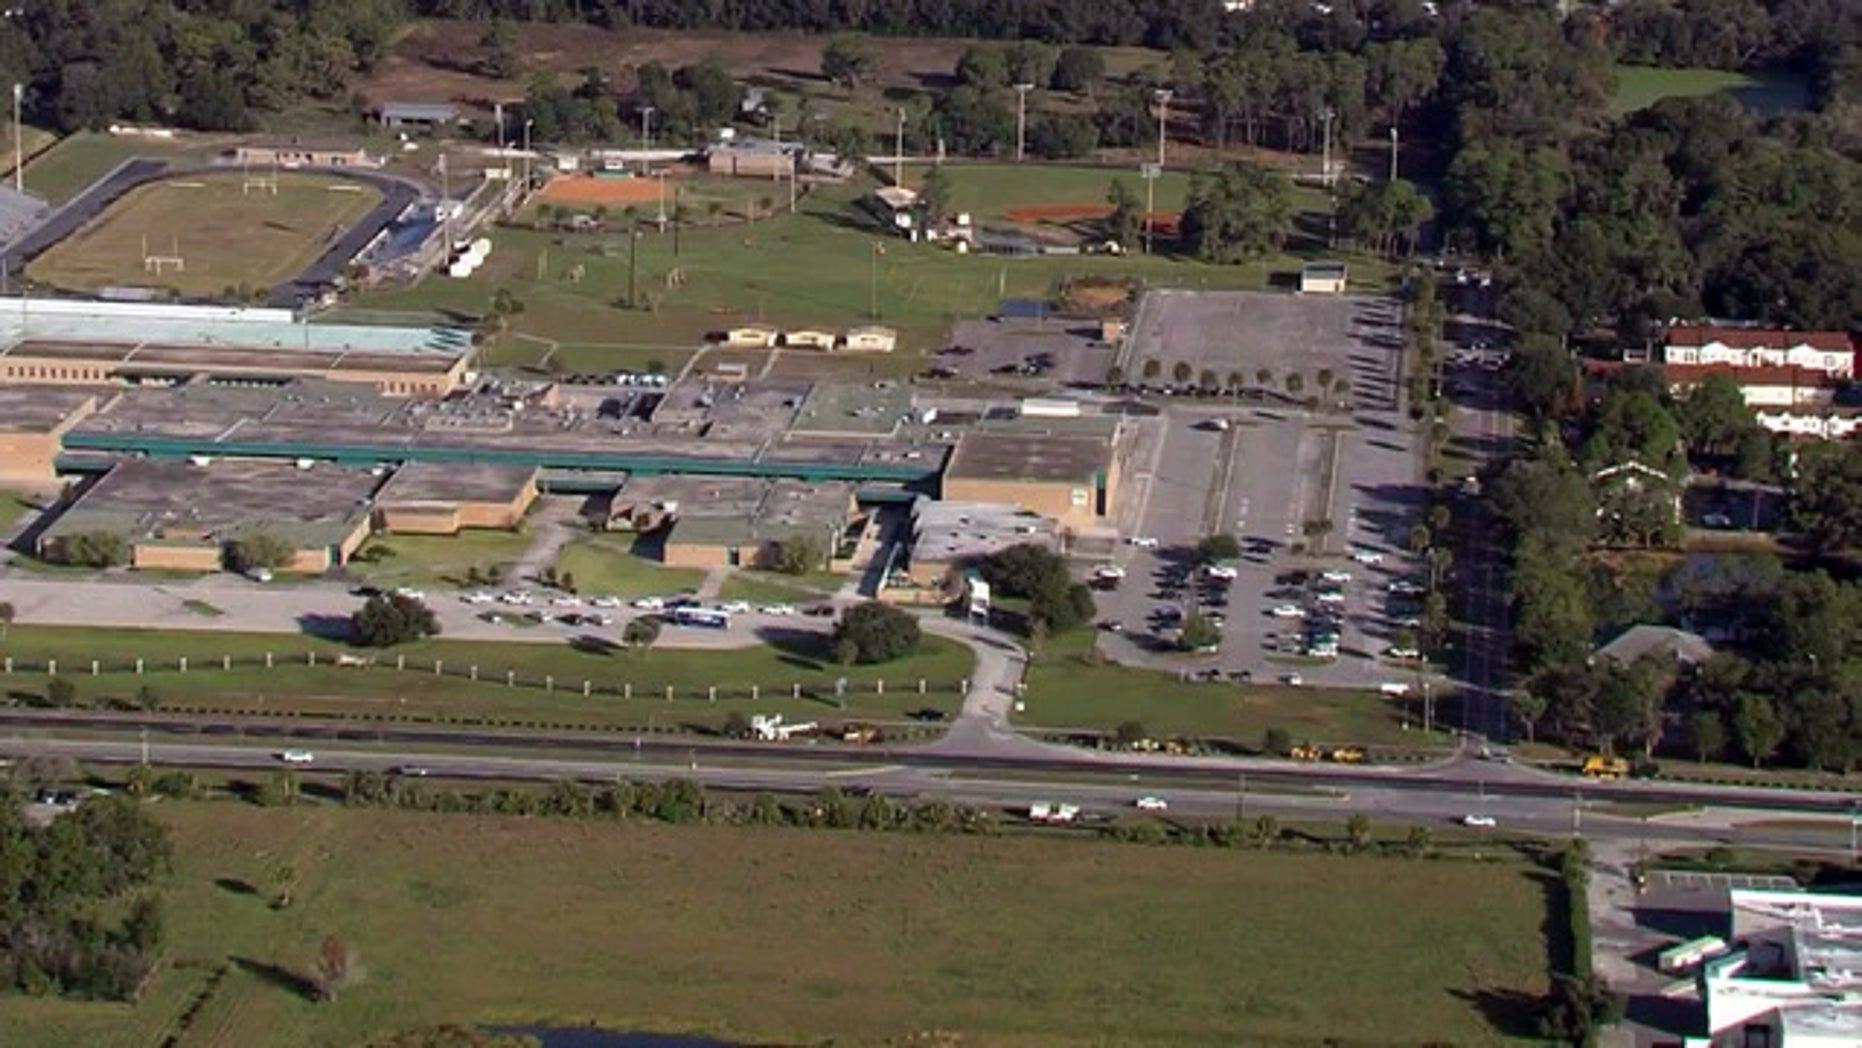 A Hillsborough County sheriff's deputy killed three family members before he killed himself near a Florida high school on Wednesday, police said.